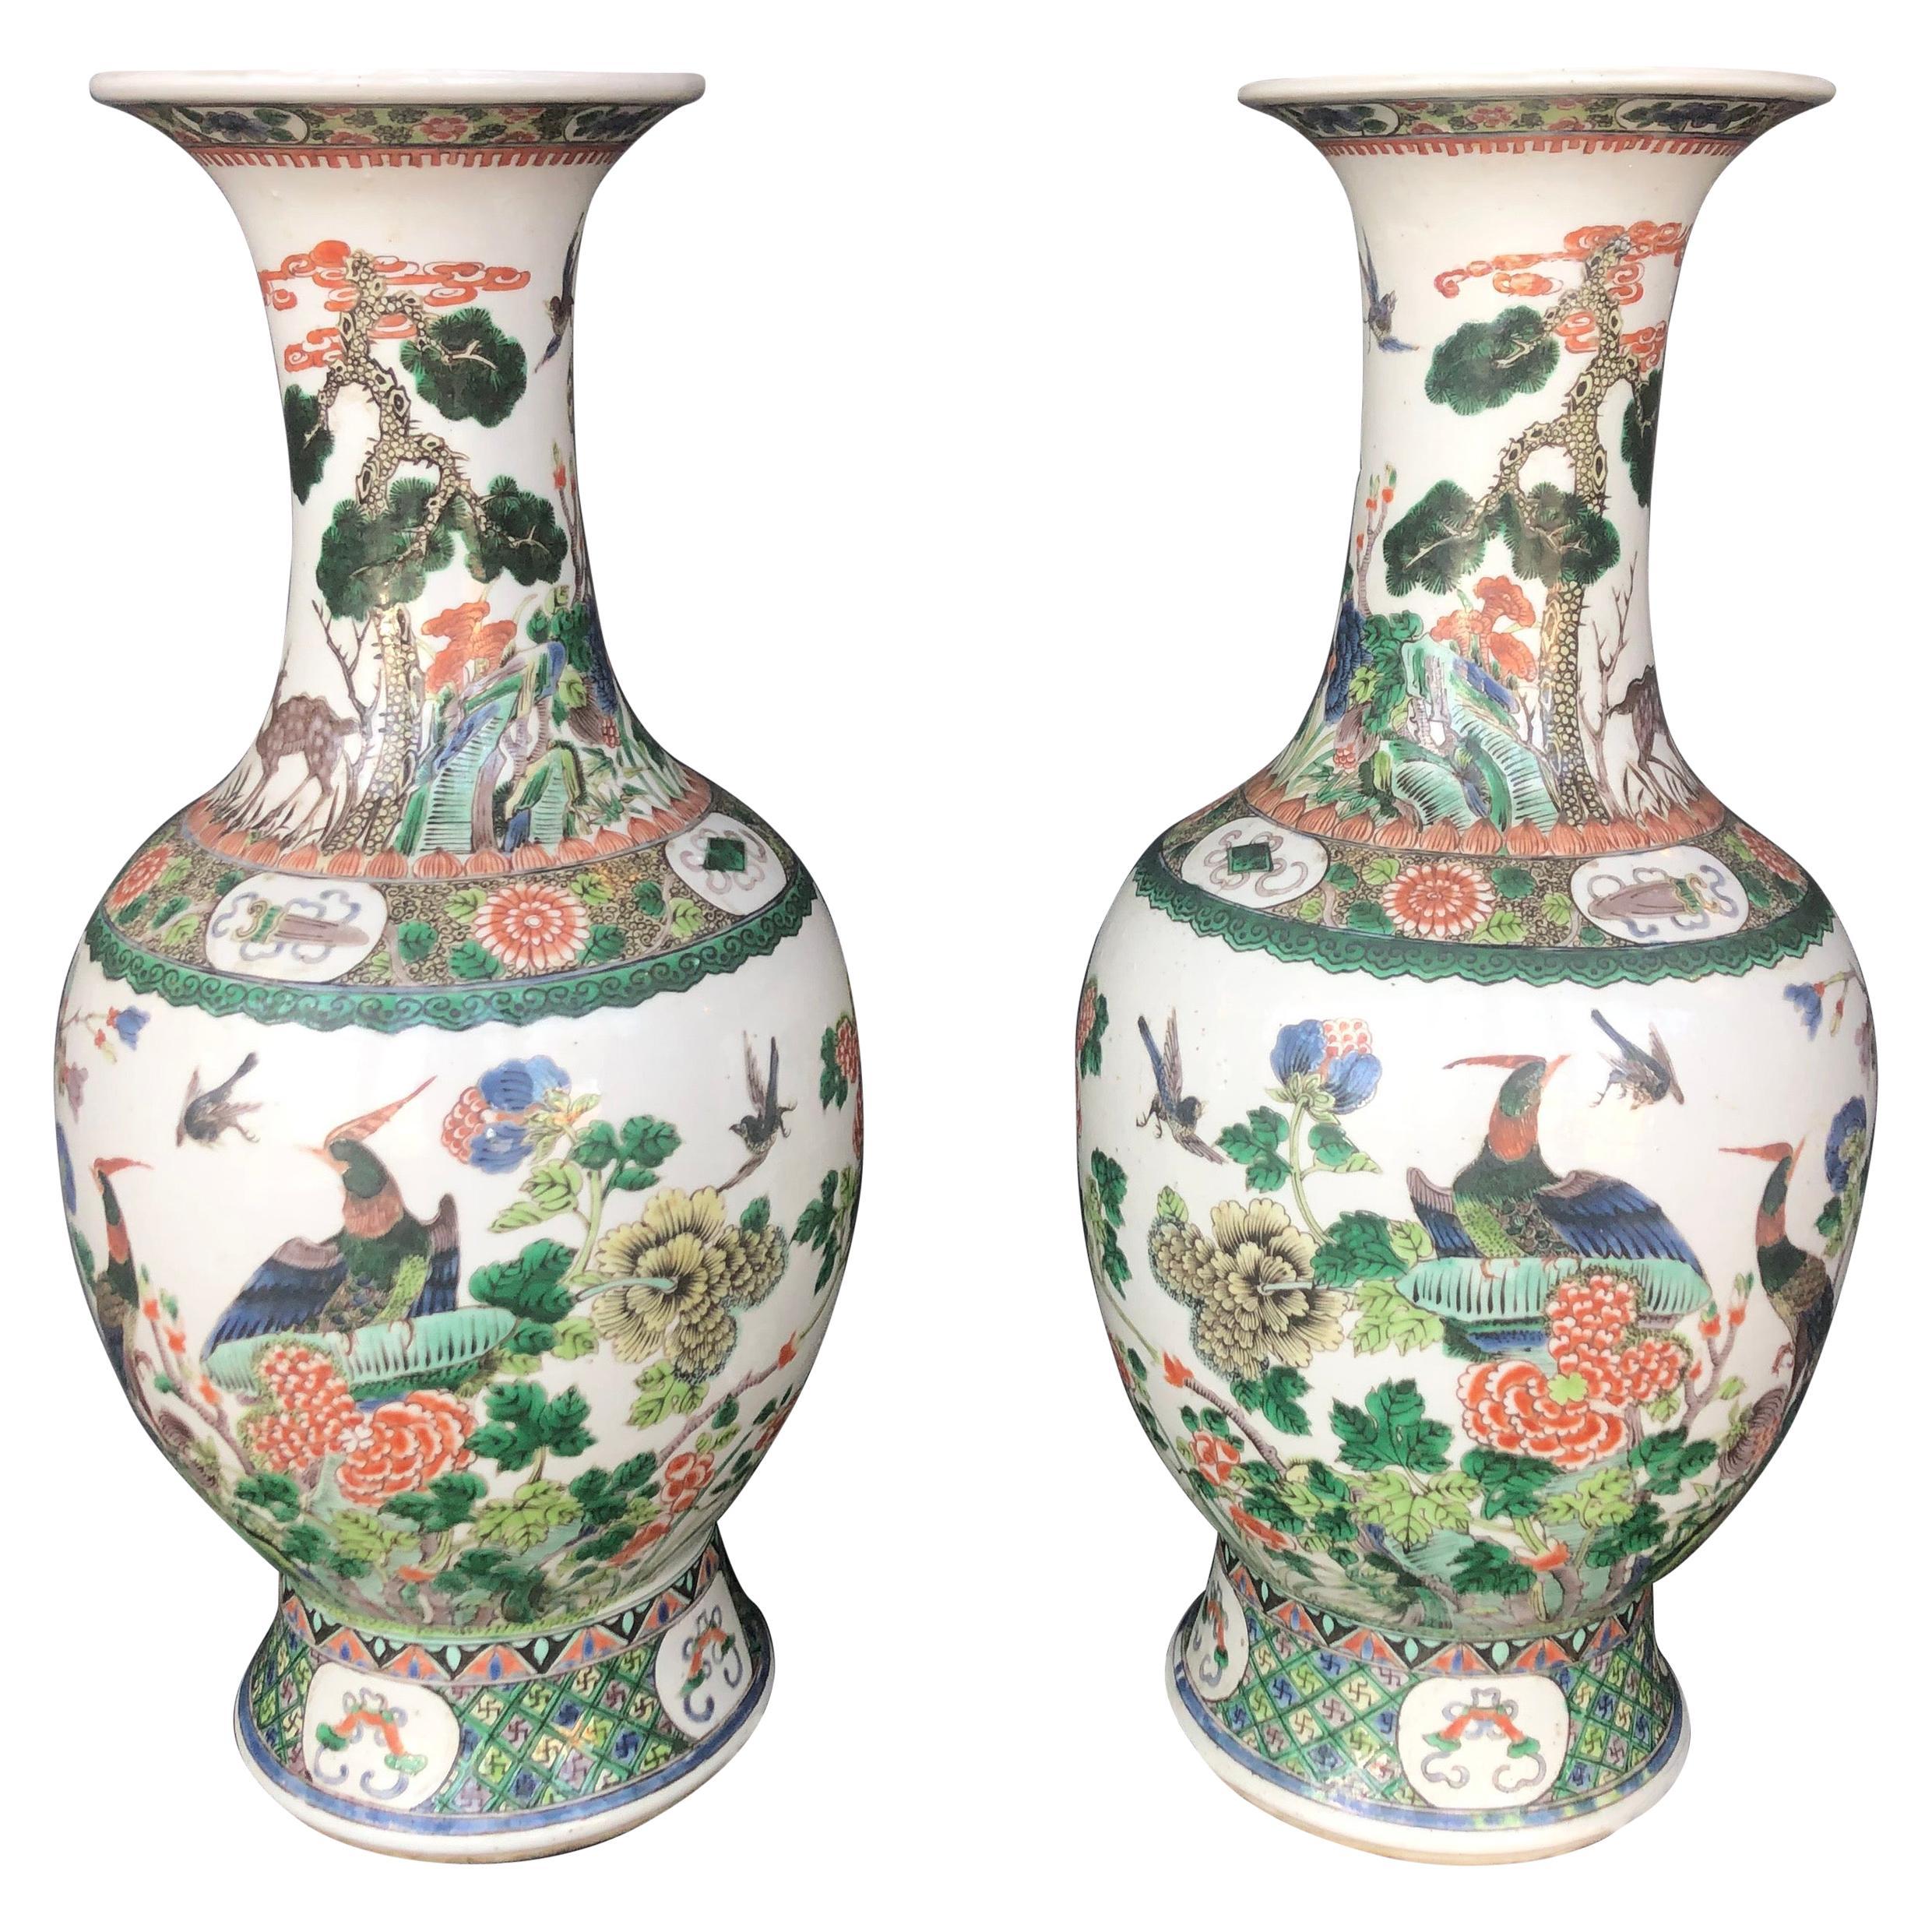 Late 19th Century Chinese Vases Famille Verte